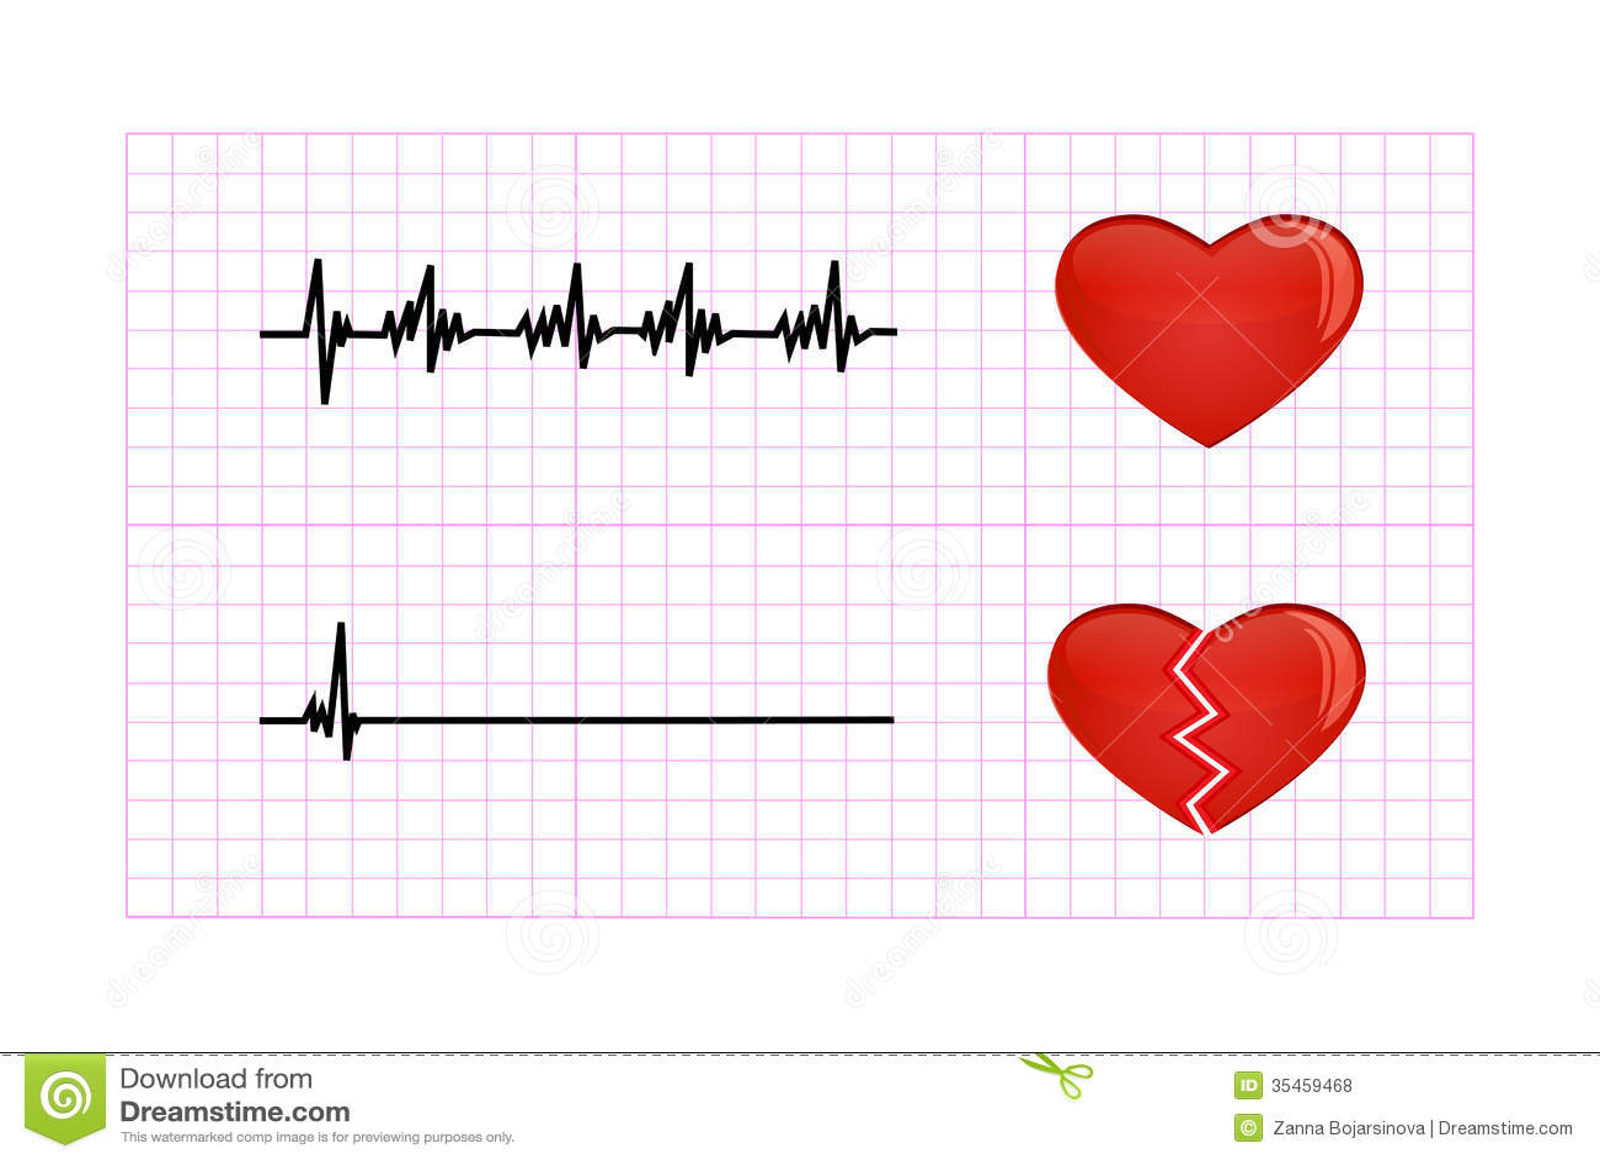 Heartbeat Diagram Illustration Royalty Free Stock Photos